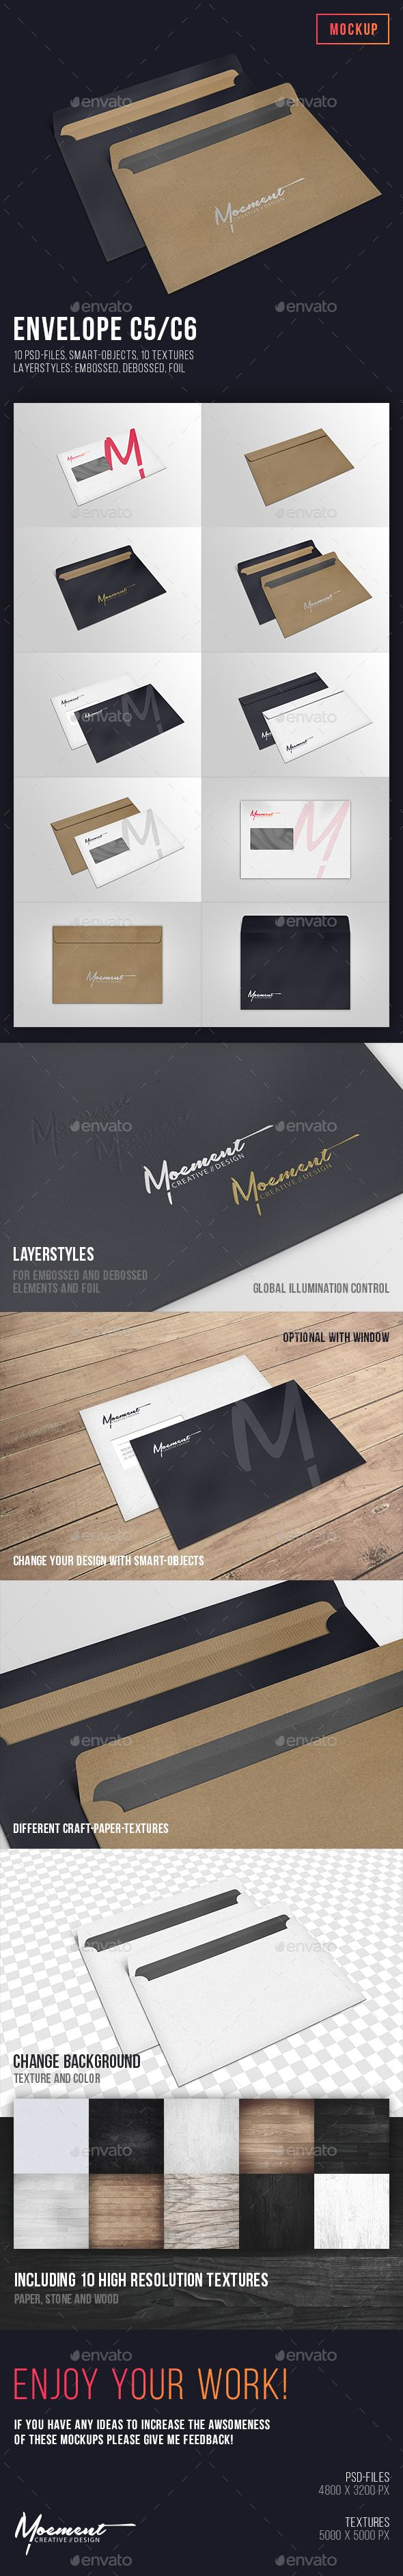 Envelope C5/C6 Mockup Download here: https://graphicriver.net/item/envelope-c5c6-mockup/19588130?ref=KlitVogli